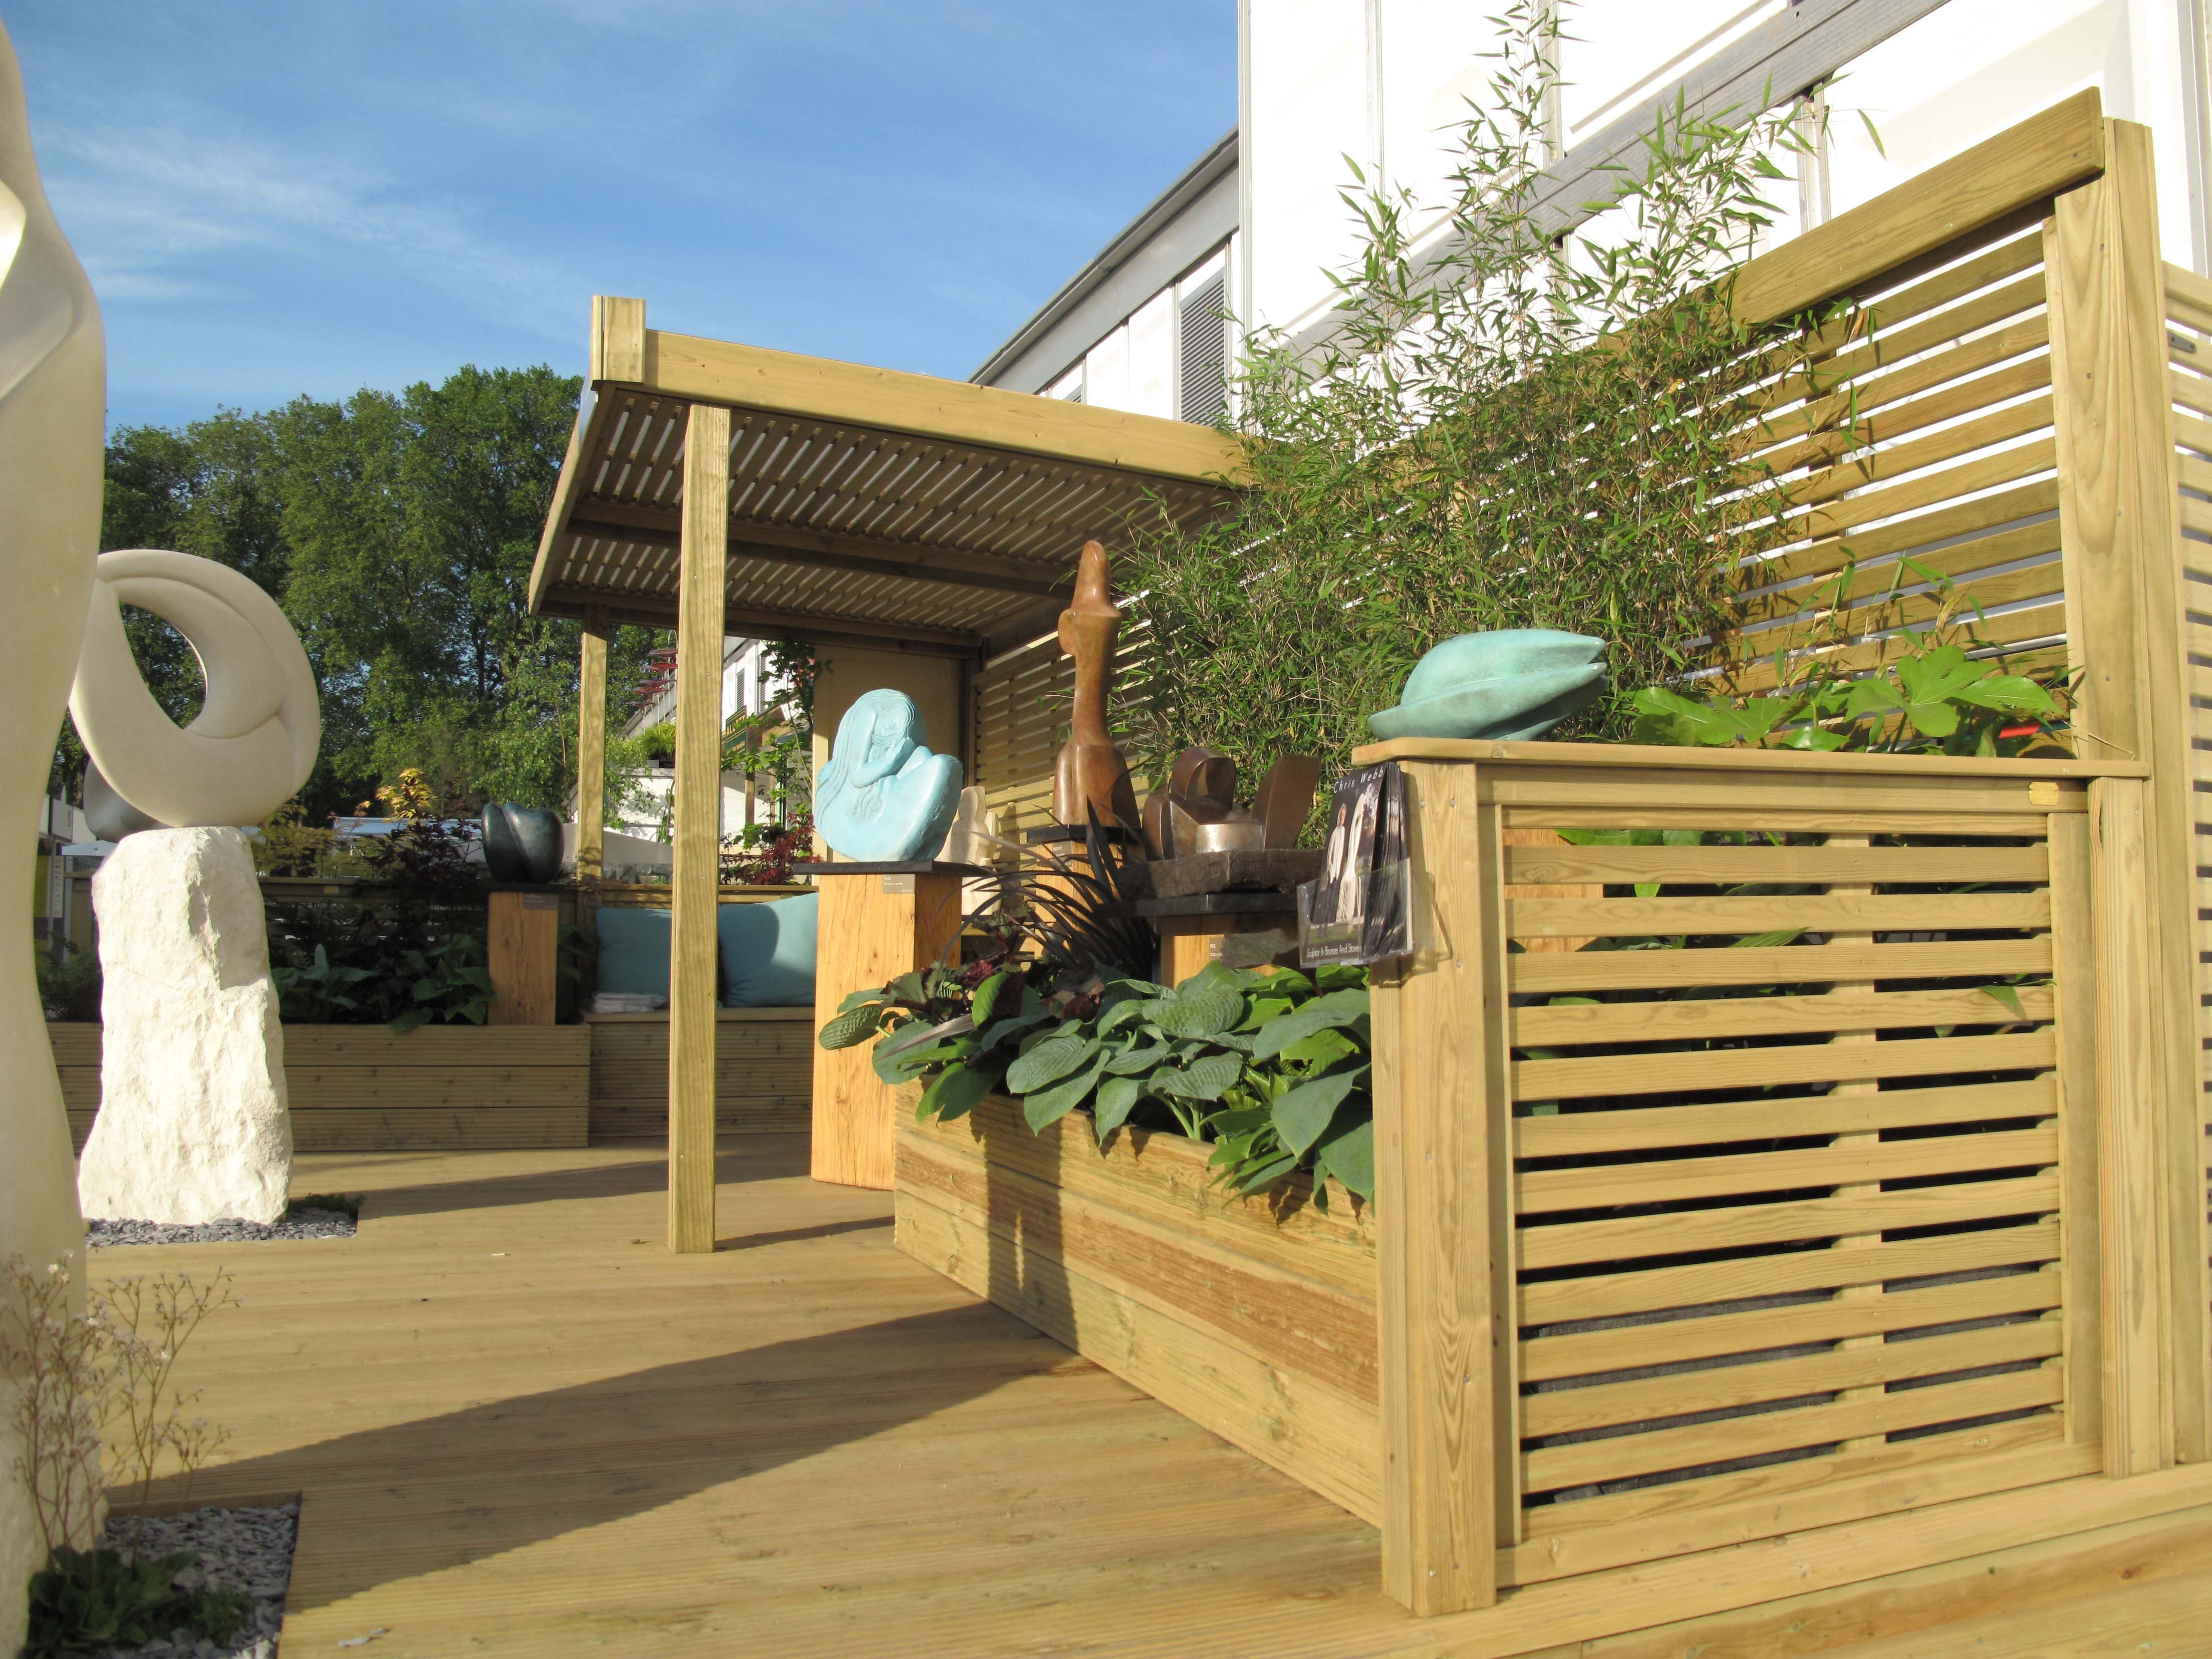 Garden Ideas 2014 Uk jacksons retreat in chris webb's garden at rhs chelsea 2014 http